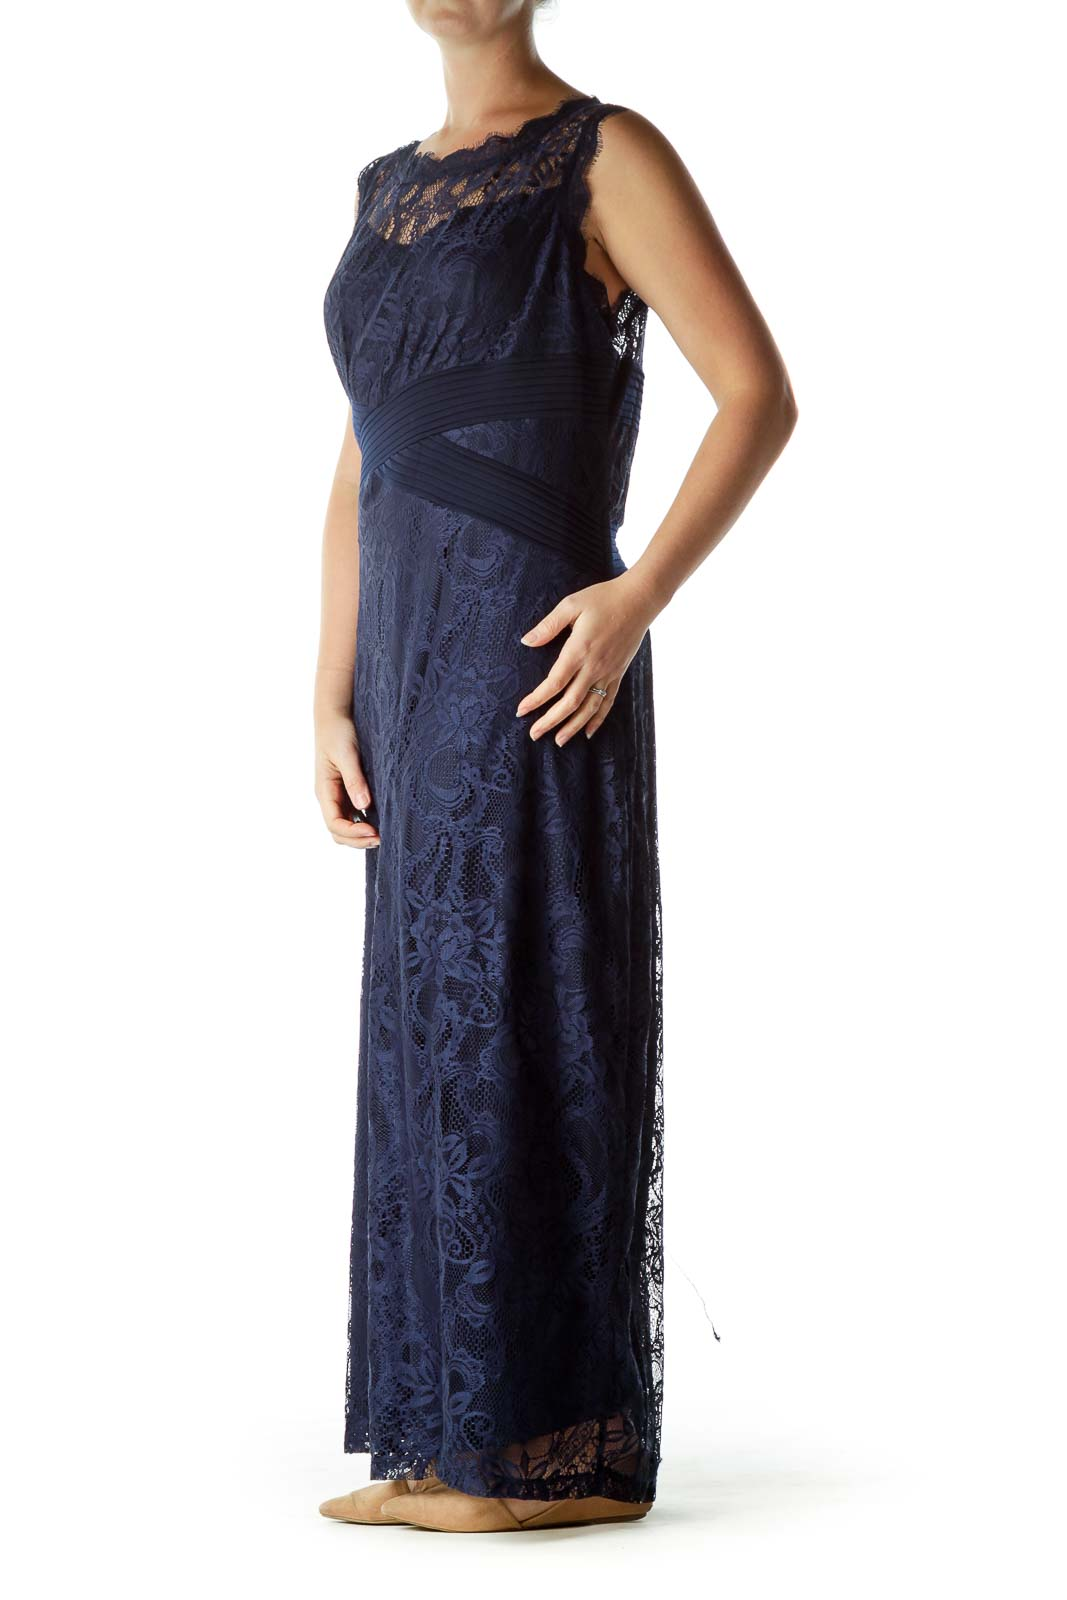 300c1378a9 Wristwatch by Versace. Wristwatch by Versace. Next. Candalite Women s. Navy  Lace Sleeveless Maxi Dress